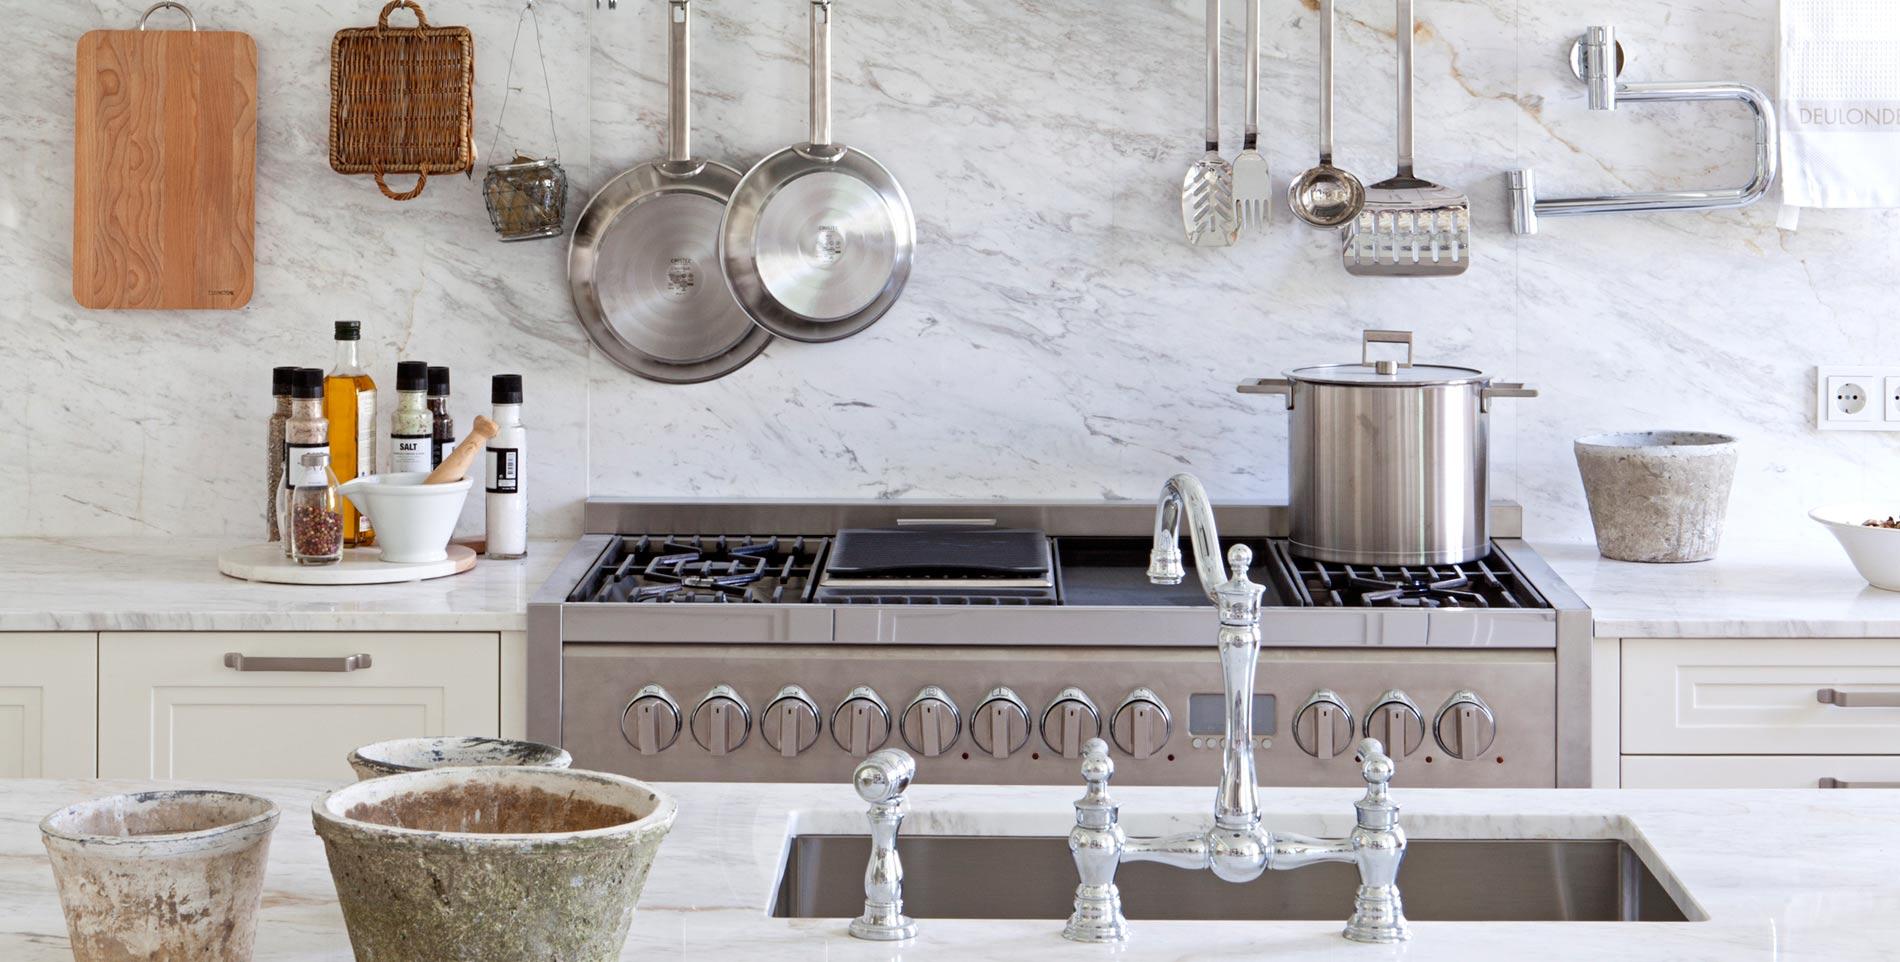 mrmol para cocina levantina - Marmol Cocina